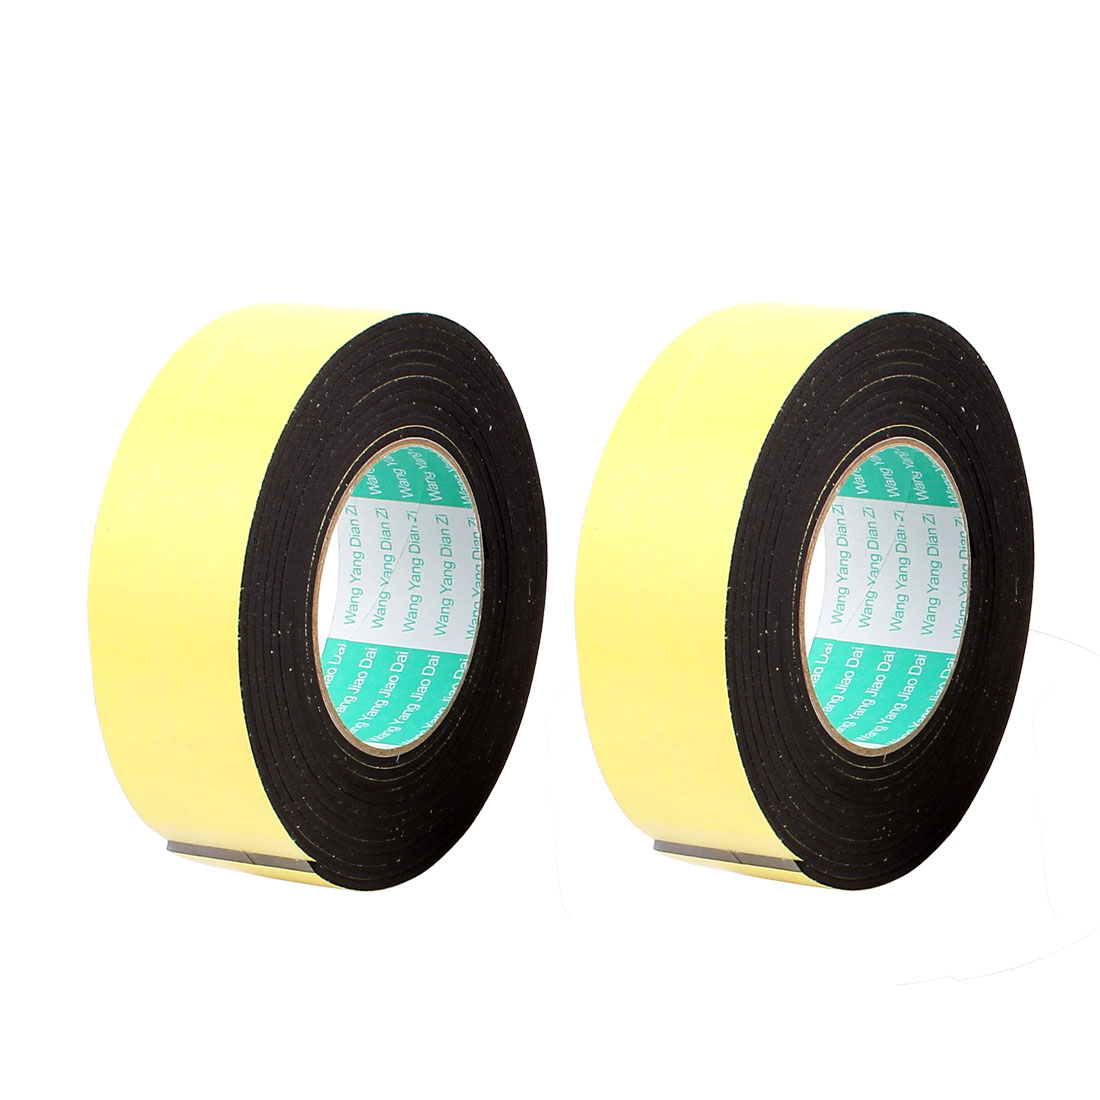 2pcs 4.5CM Width 4M Length 3MM Thick Single Sided Sealing Shockproof Sponge Tape